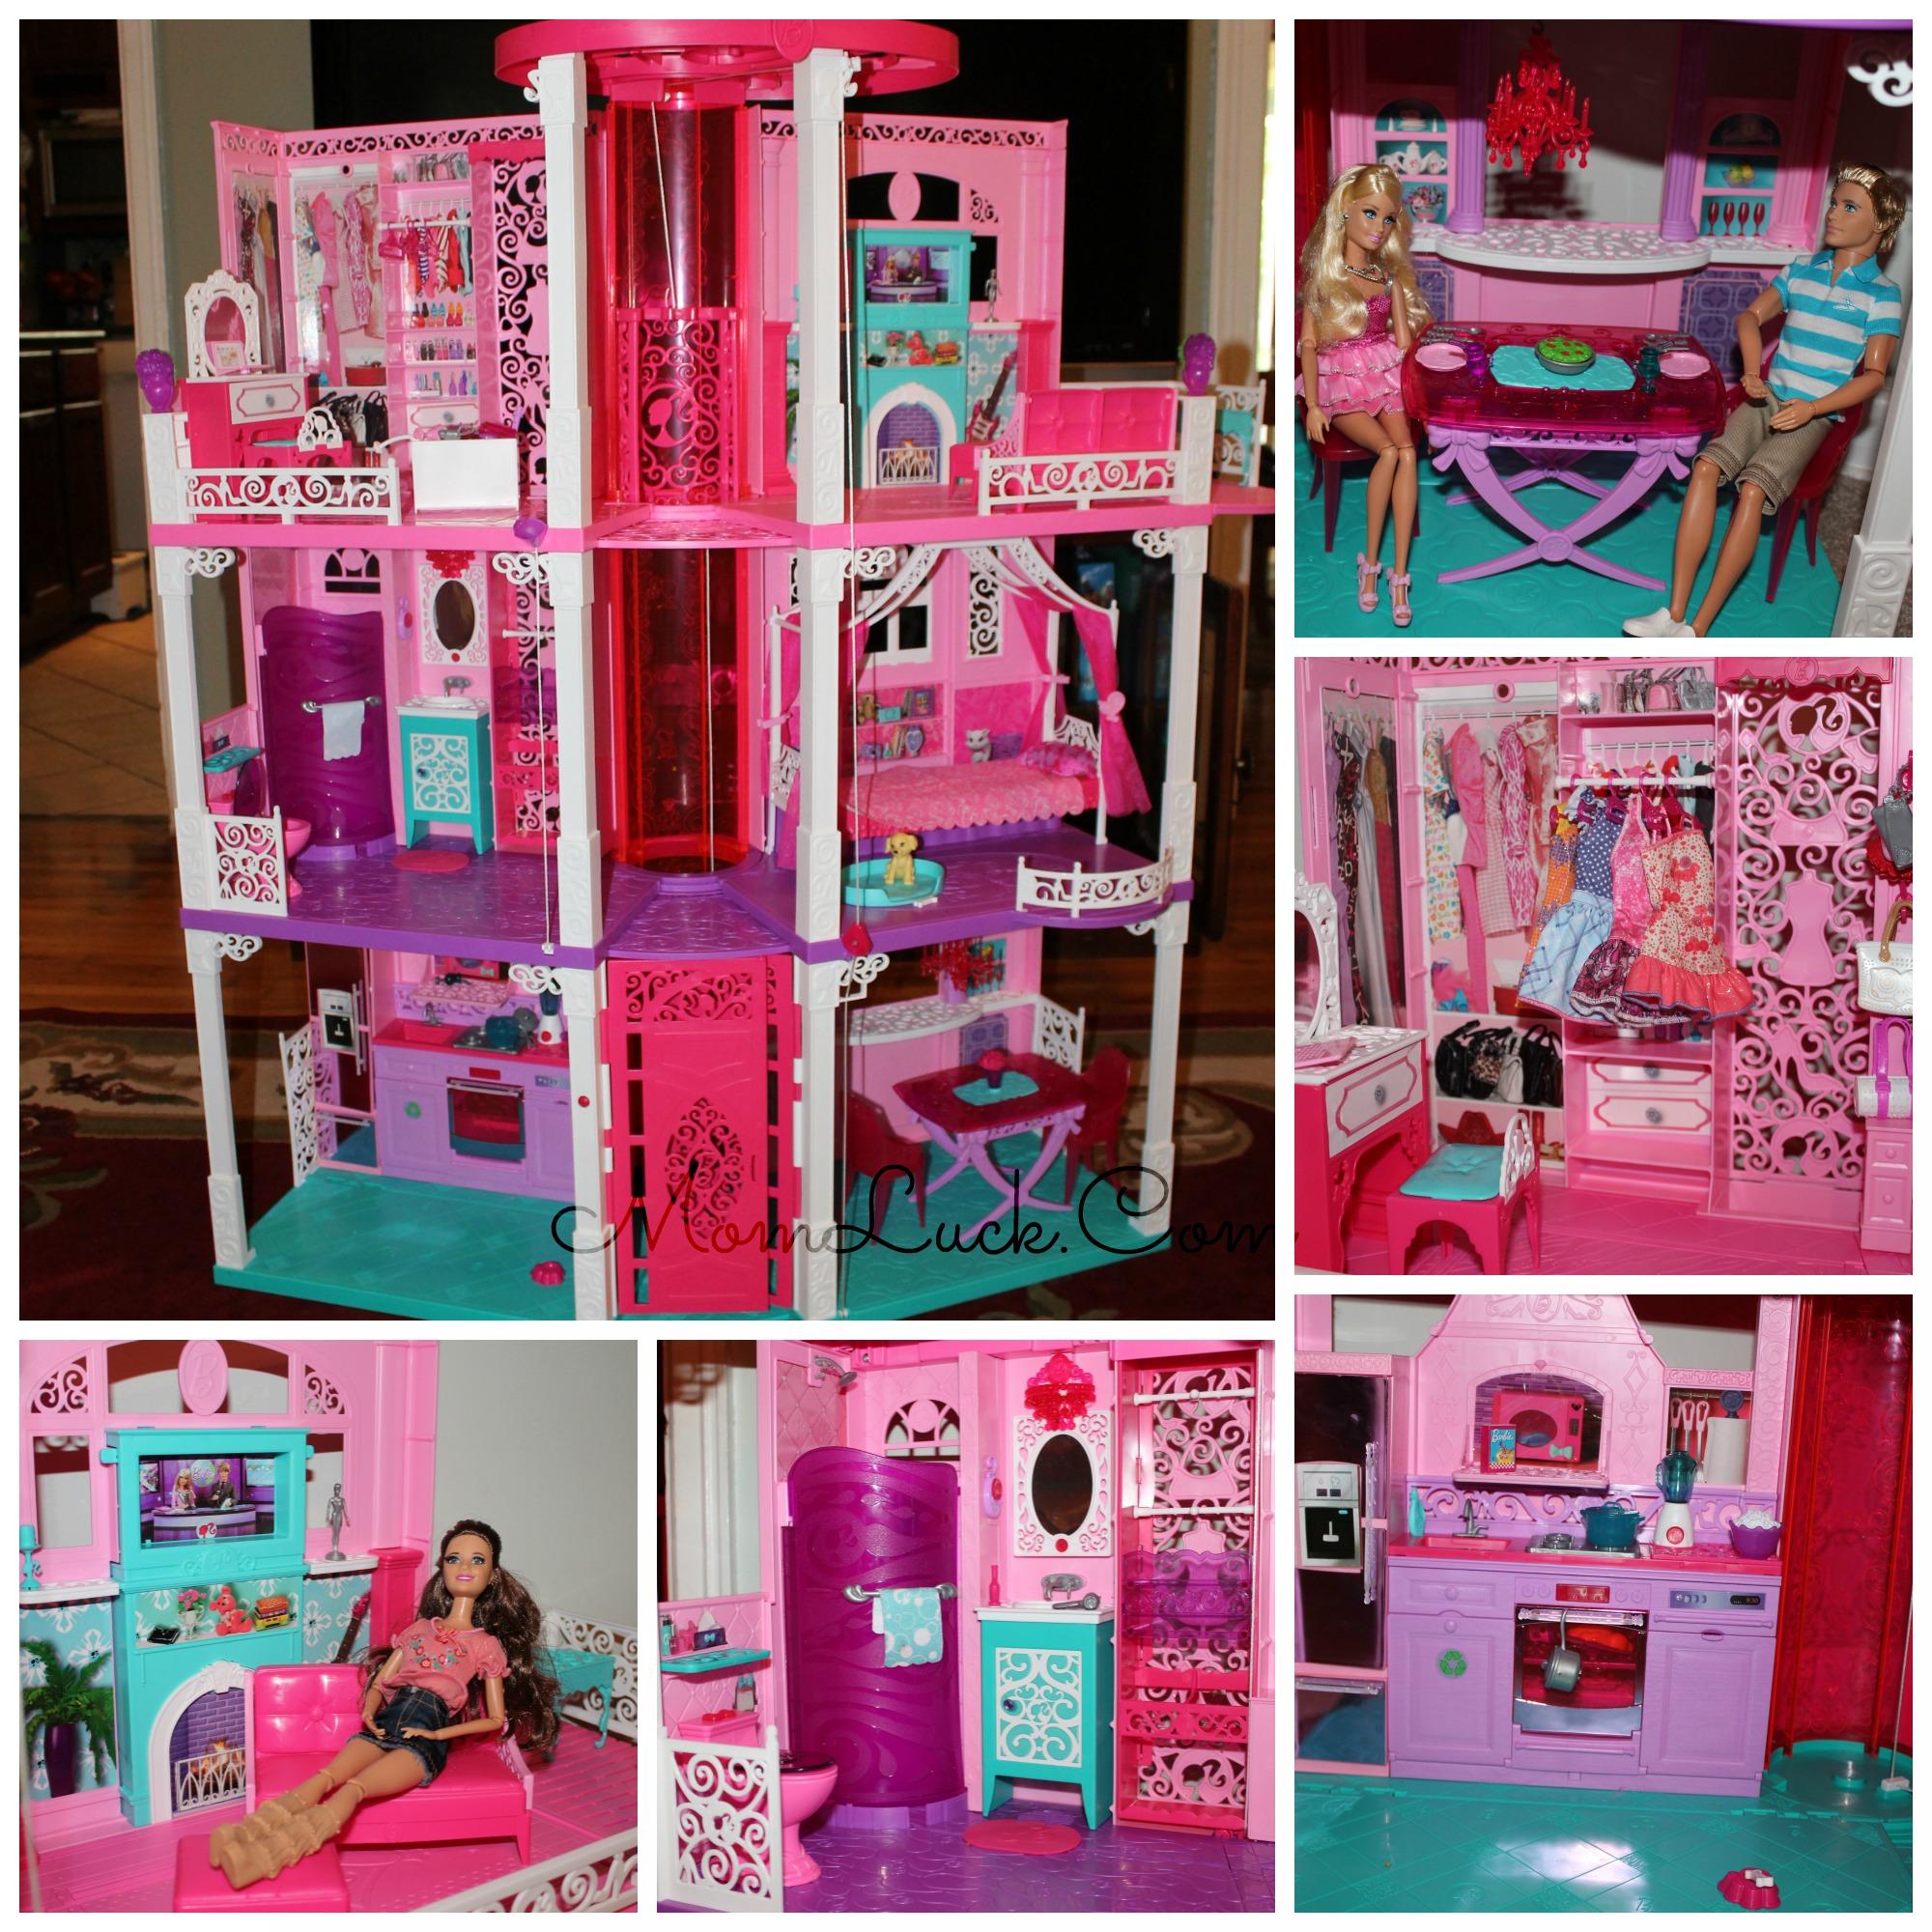 Dreamhouse 2017 Barbie Dream House Our Play